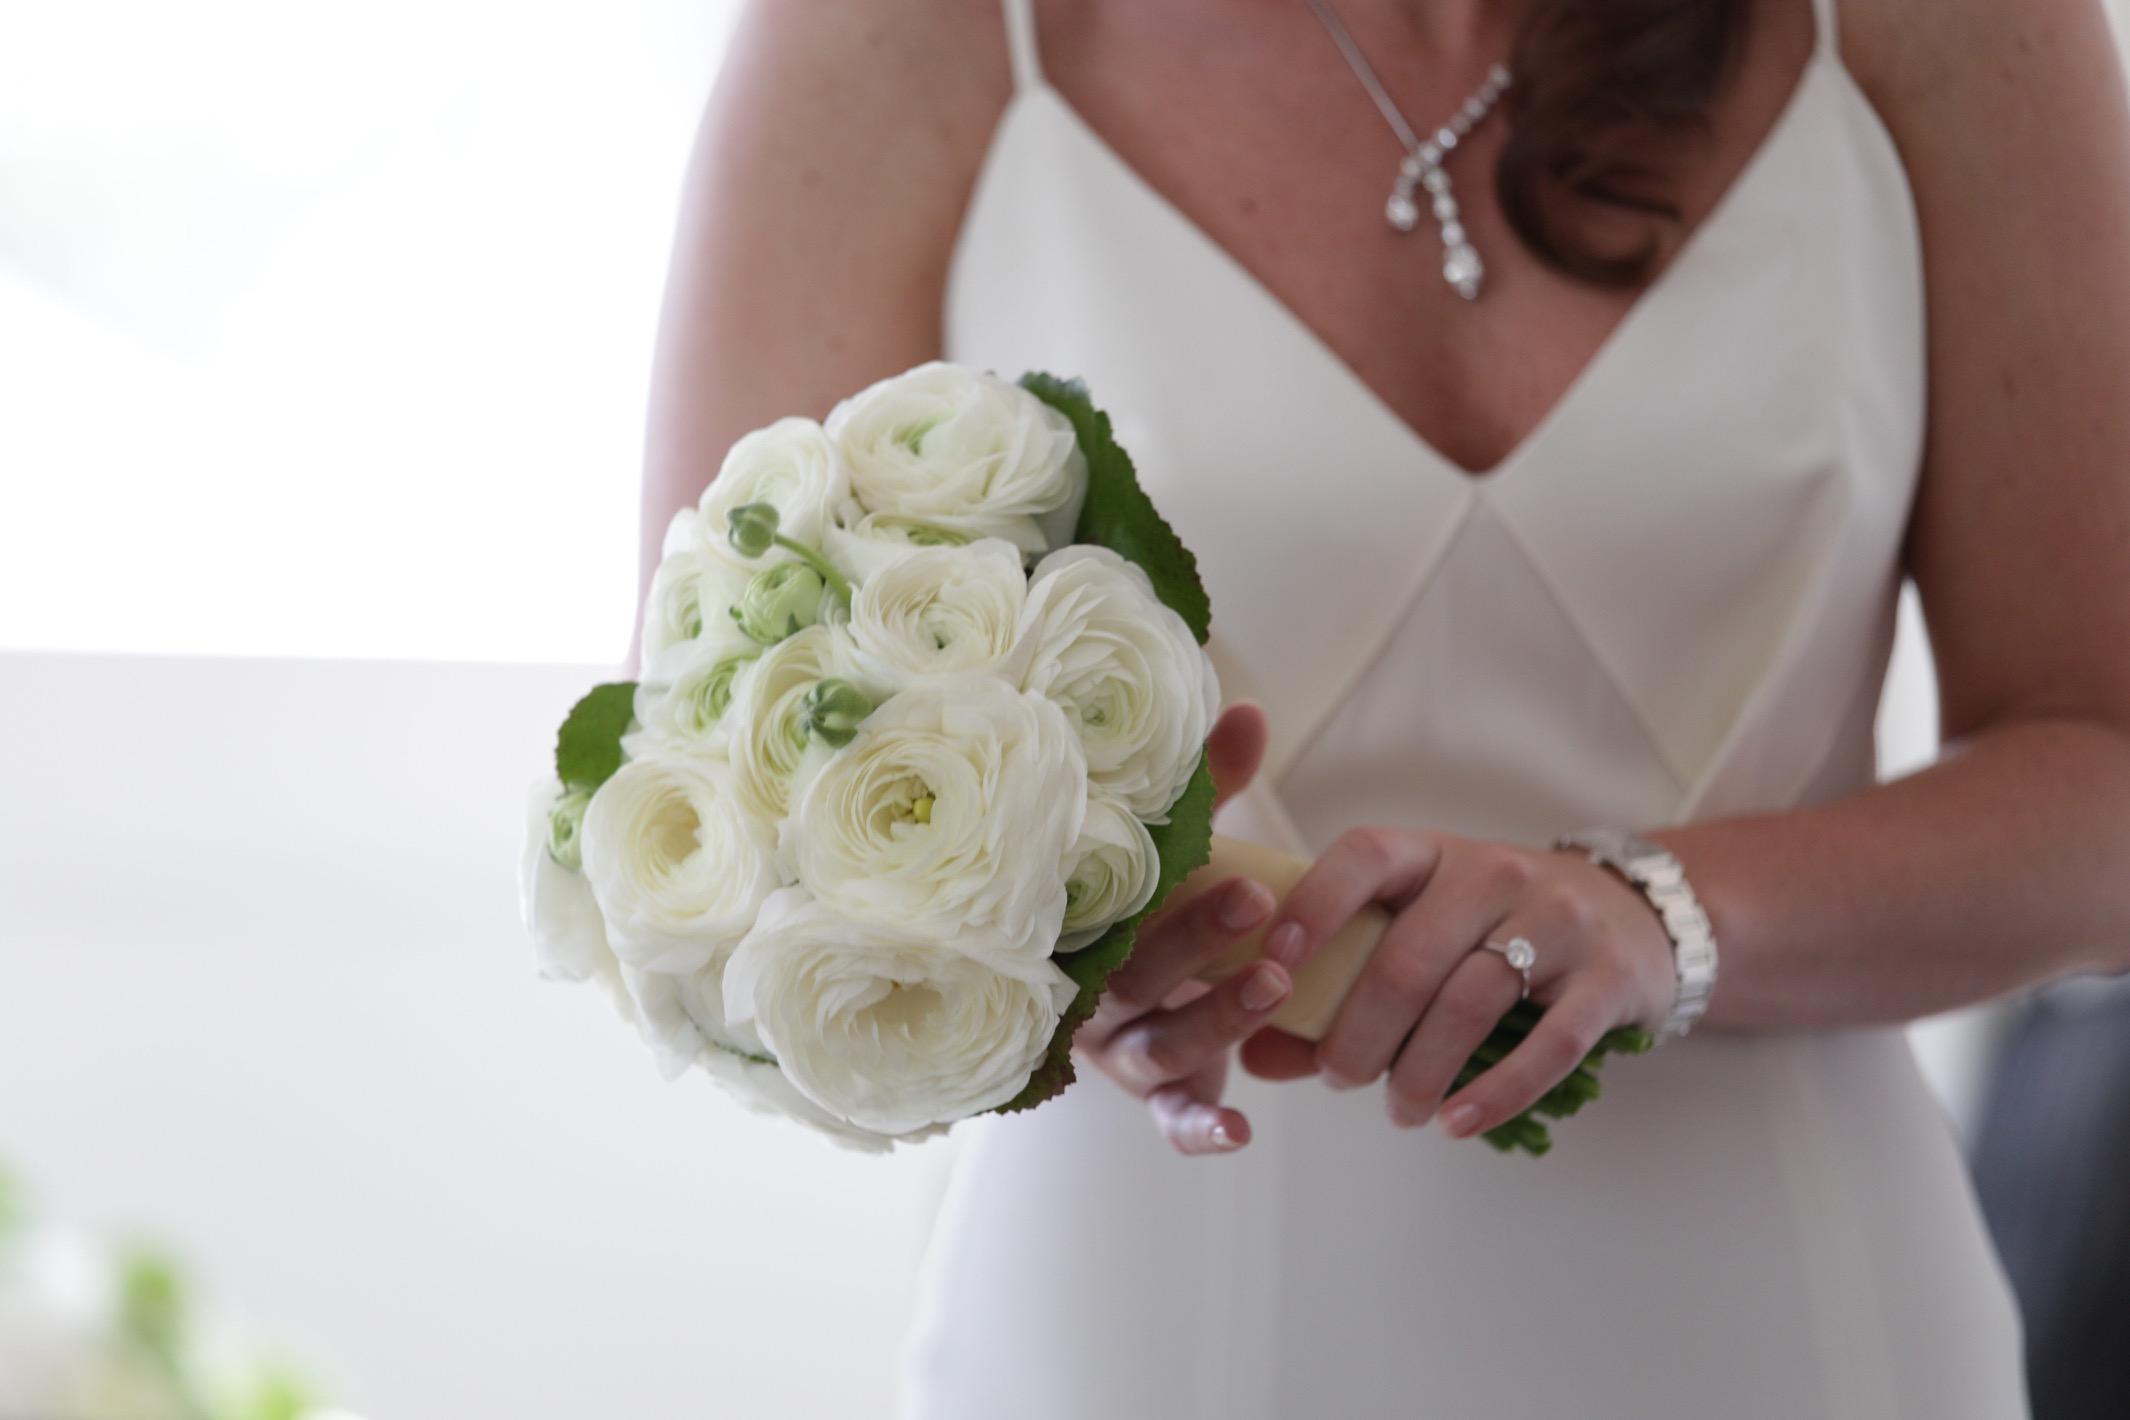 Si-Quiero-Wedding-Planner-By-Sira-Antequera-Bodas-Málaga-Marbella-Miami- Victoria-Connor-3